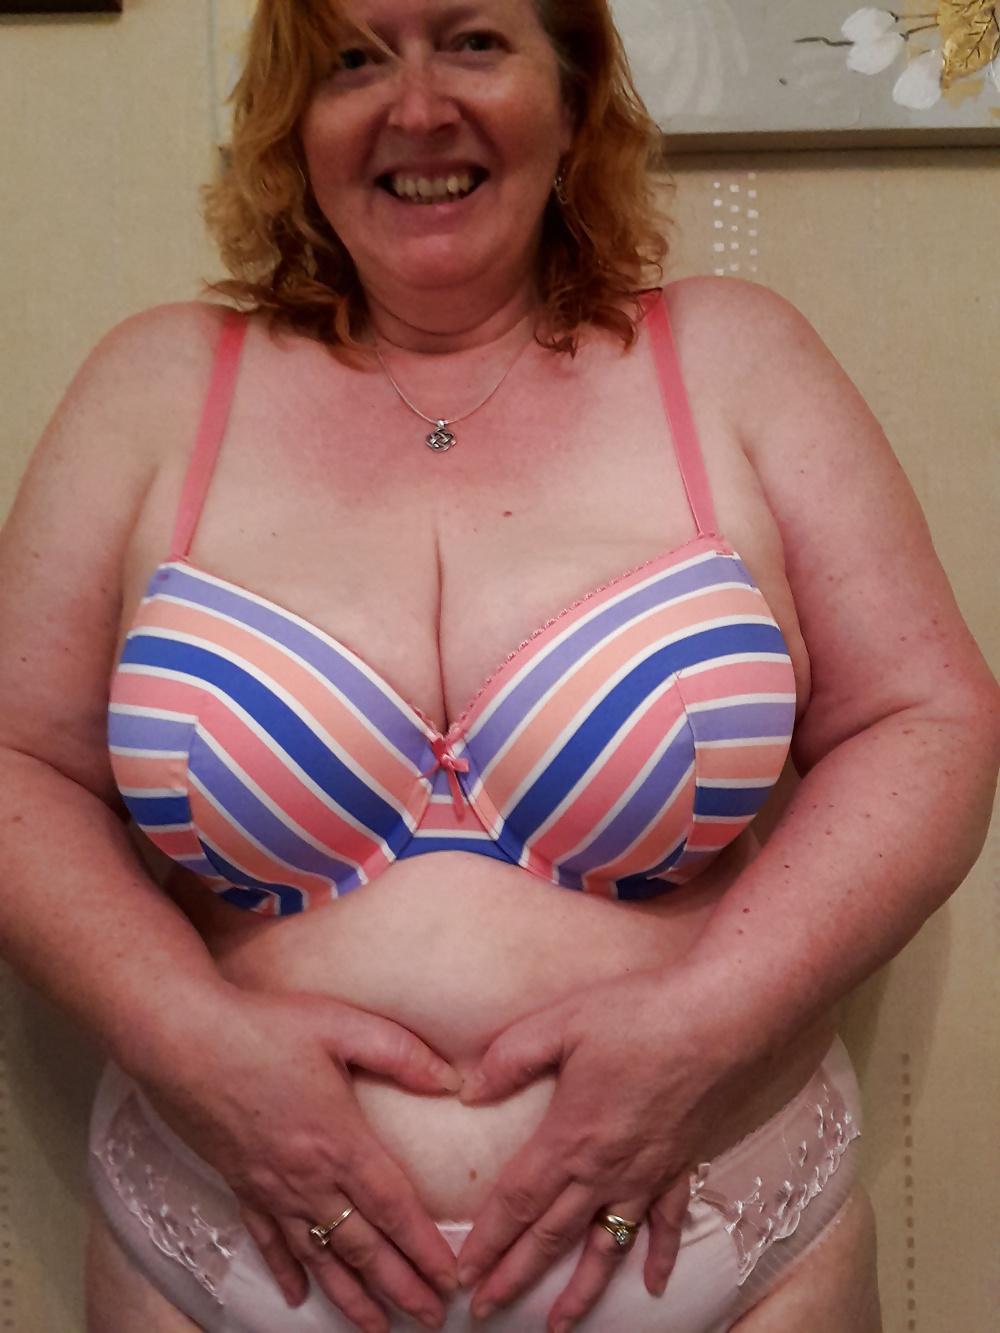 Alexis texas makes girl strip to bra and panties tnaflix porn pics